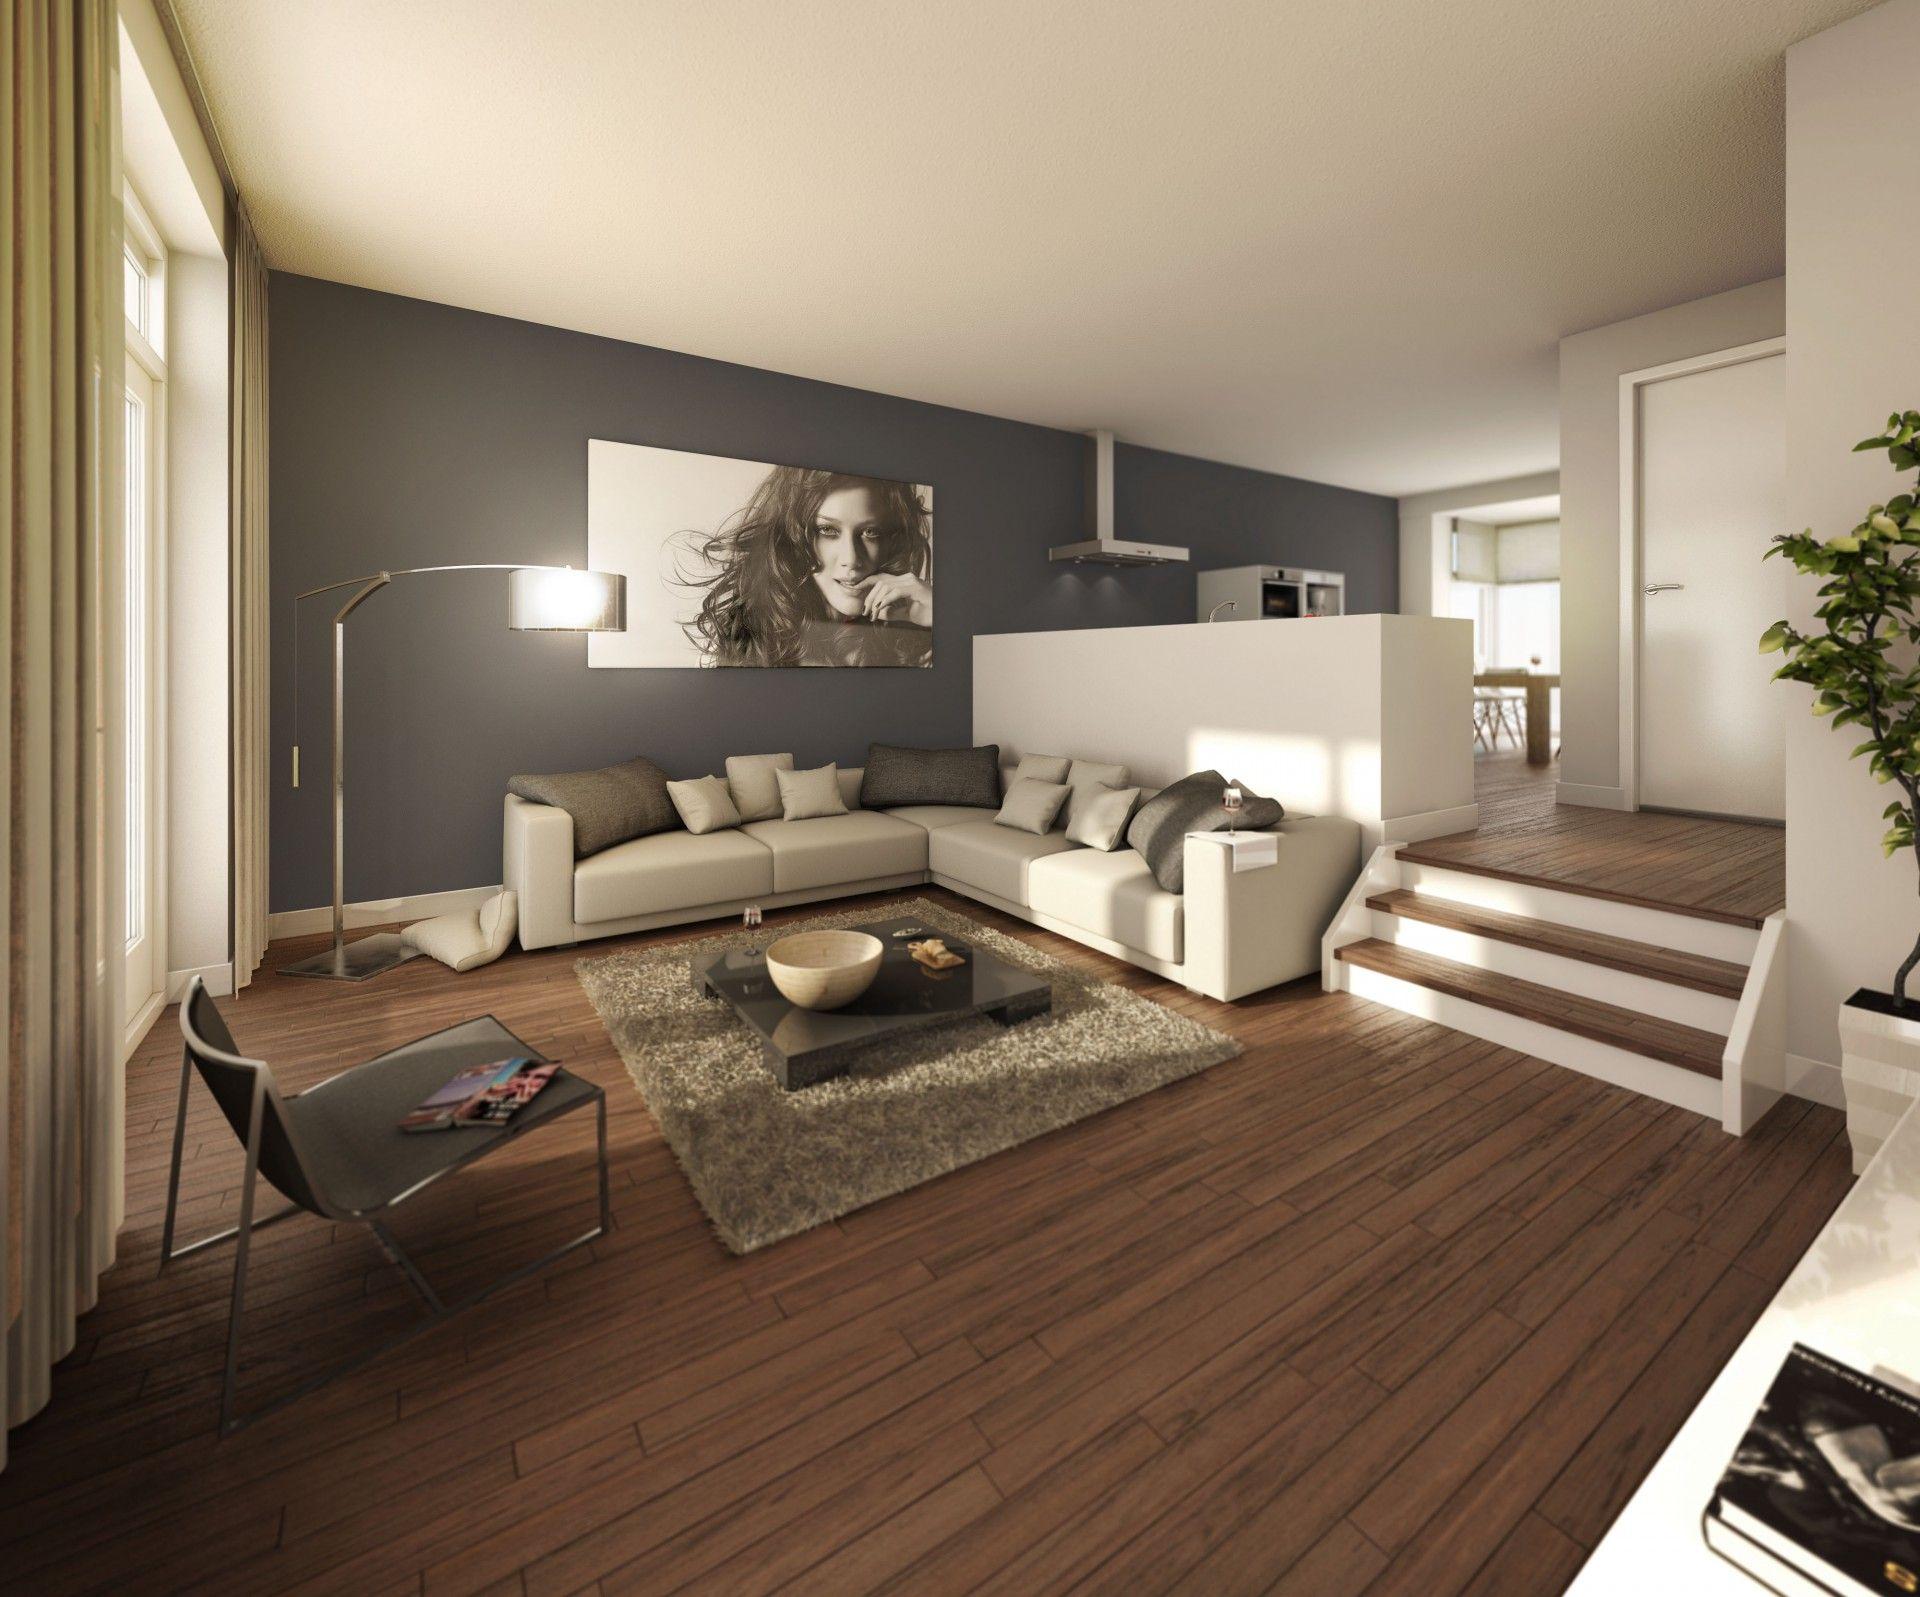 Emejing Interieur Fotos Contemporary - Huis & Interieur Ideeën ...